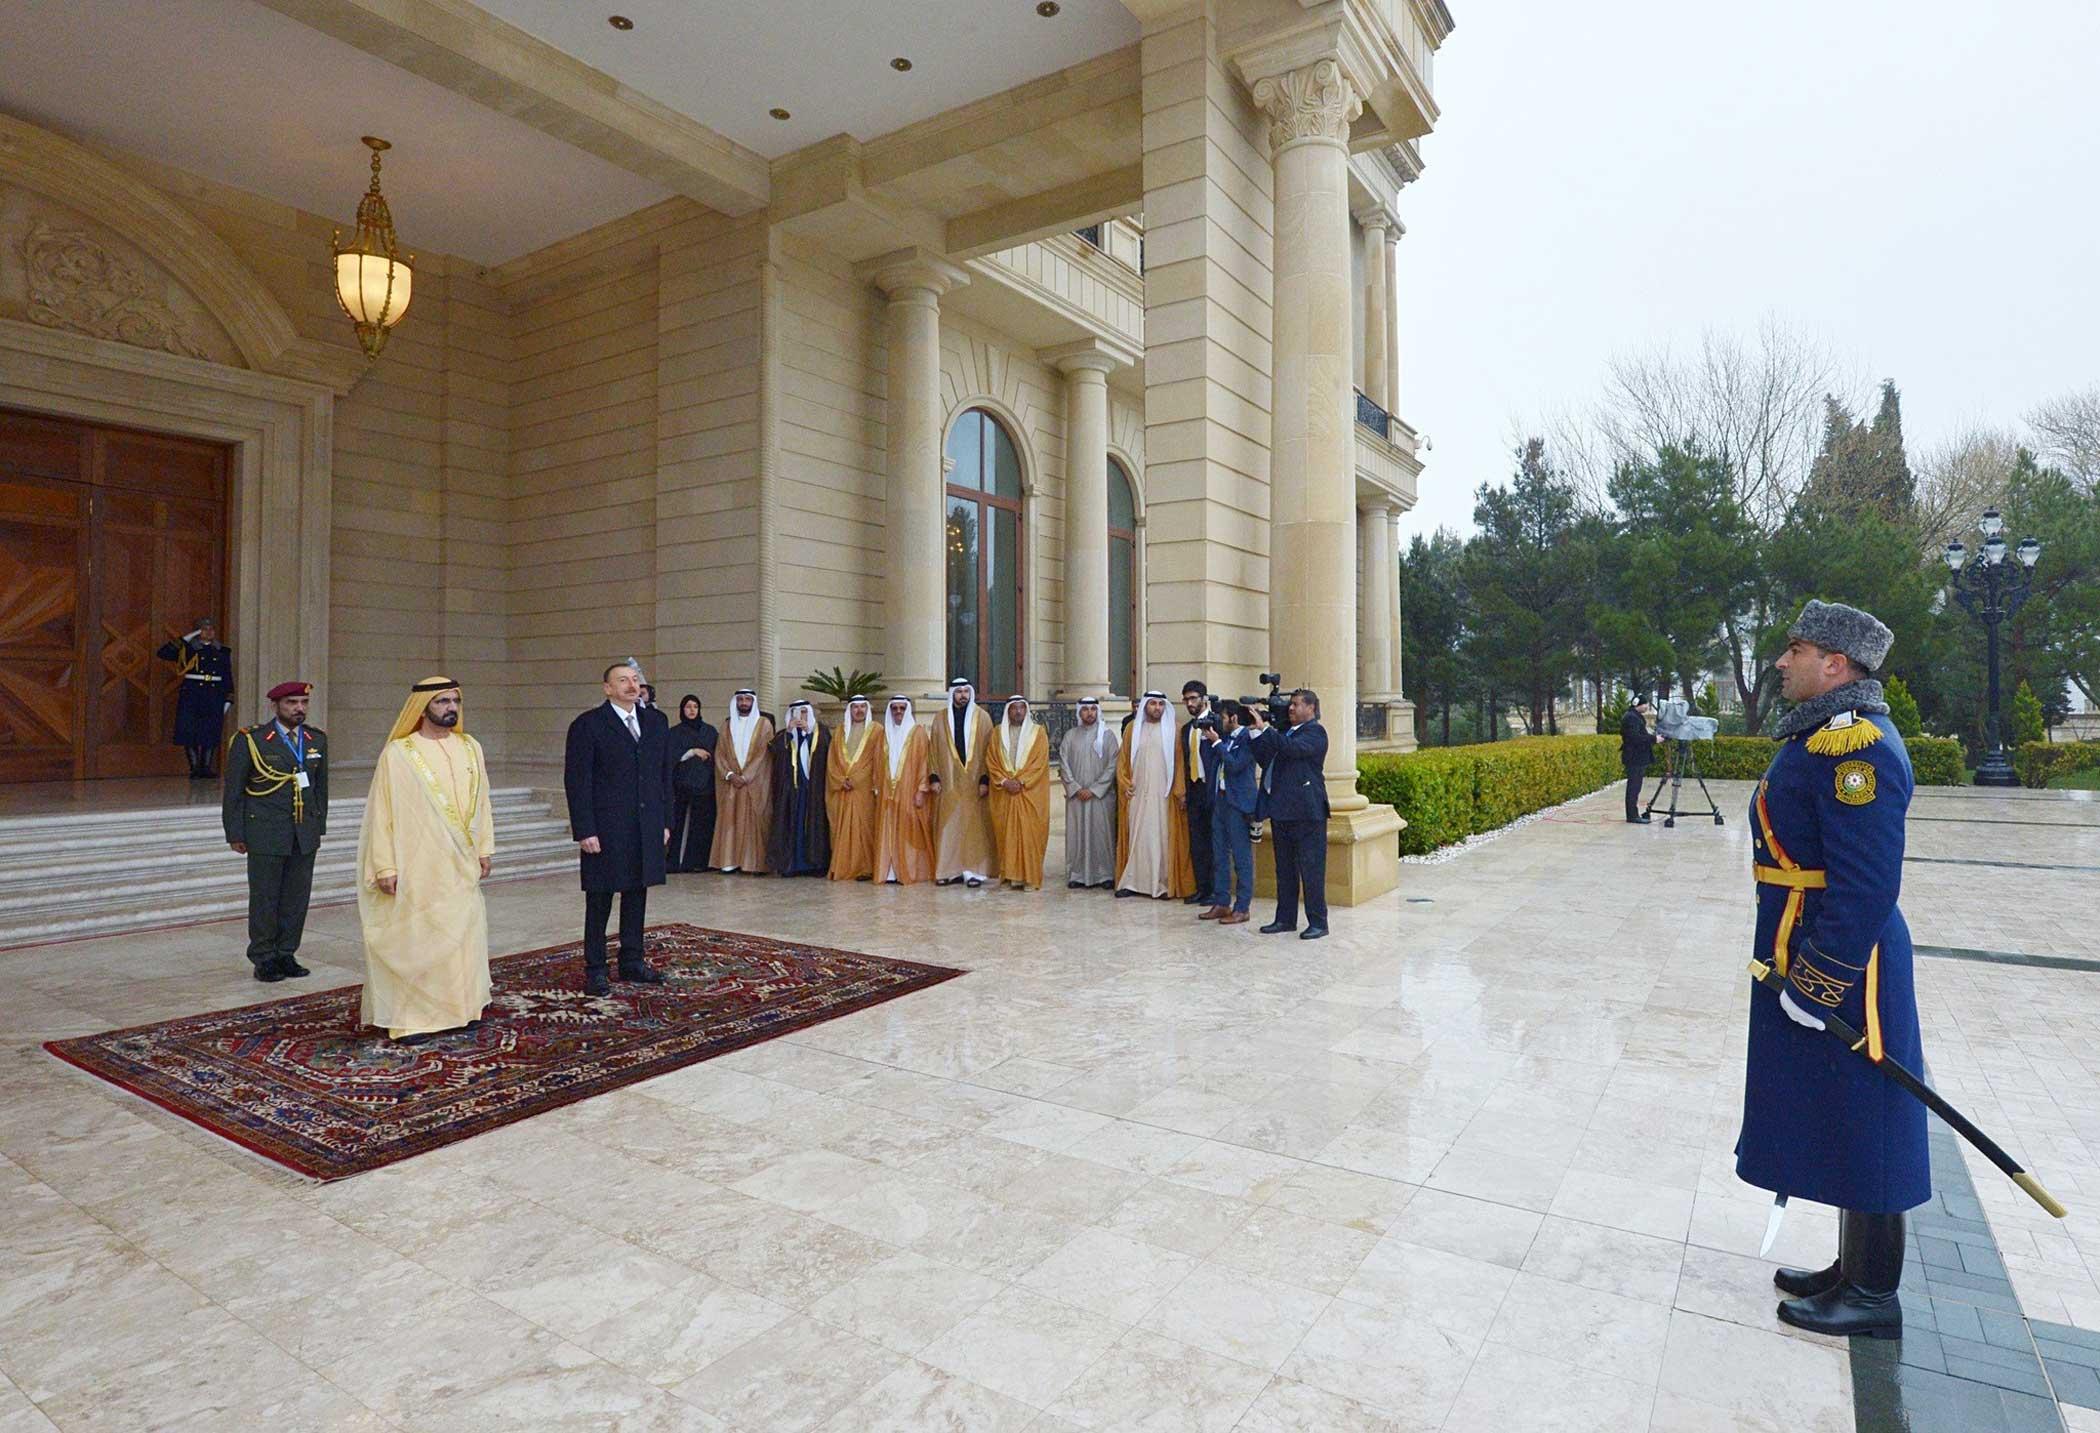 Vice President and Prime Minister of the United Arab Emirates (UAE) Mohammed bin Rashid Al Maktoum (L) is seen next to Azerbaijani President Ilham Aliyev (L 2) during his official visit in Baku, Azerbaijan on April 2, 2015.